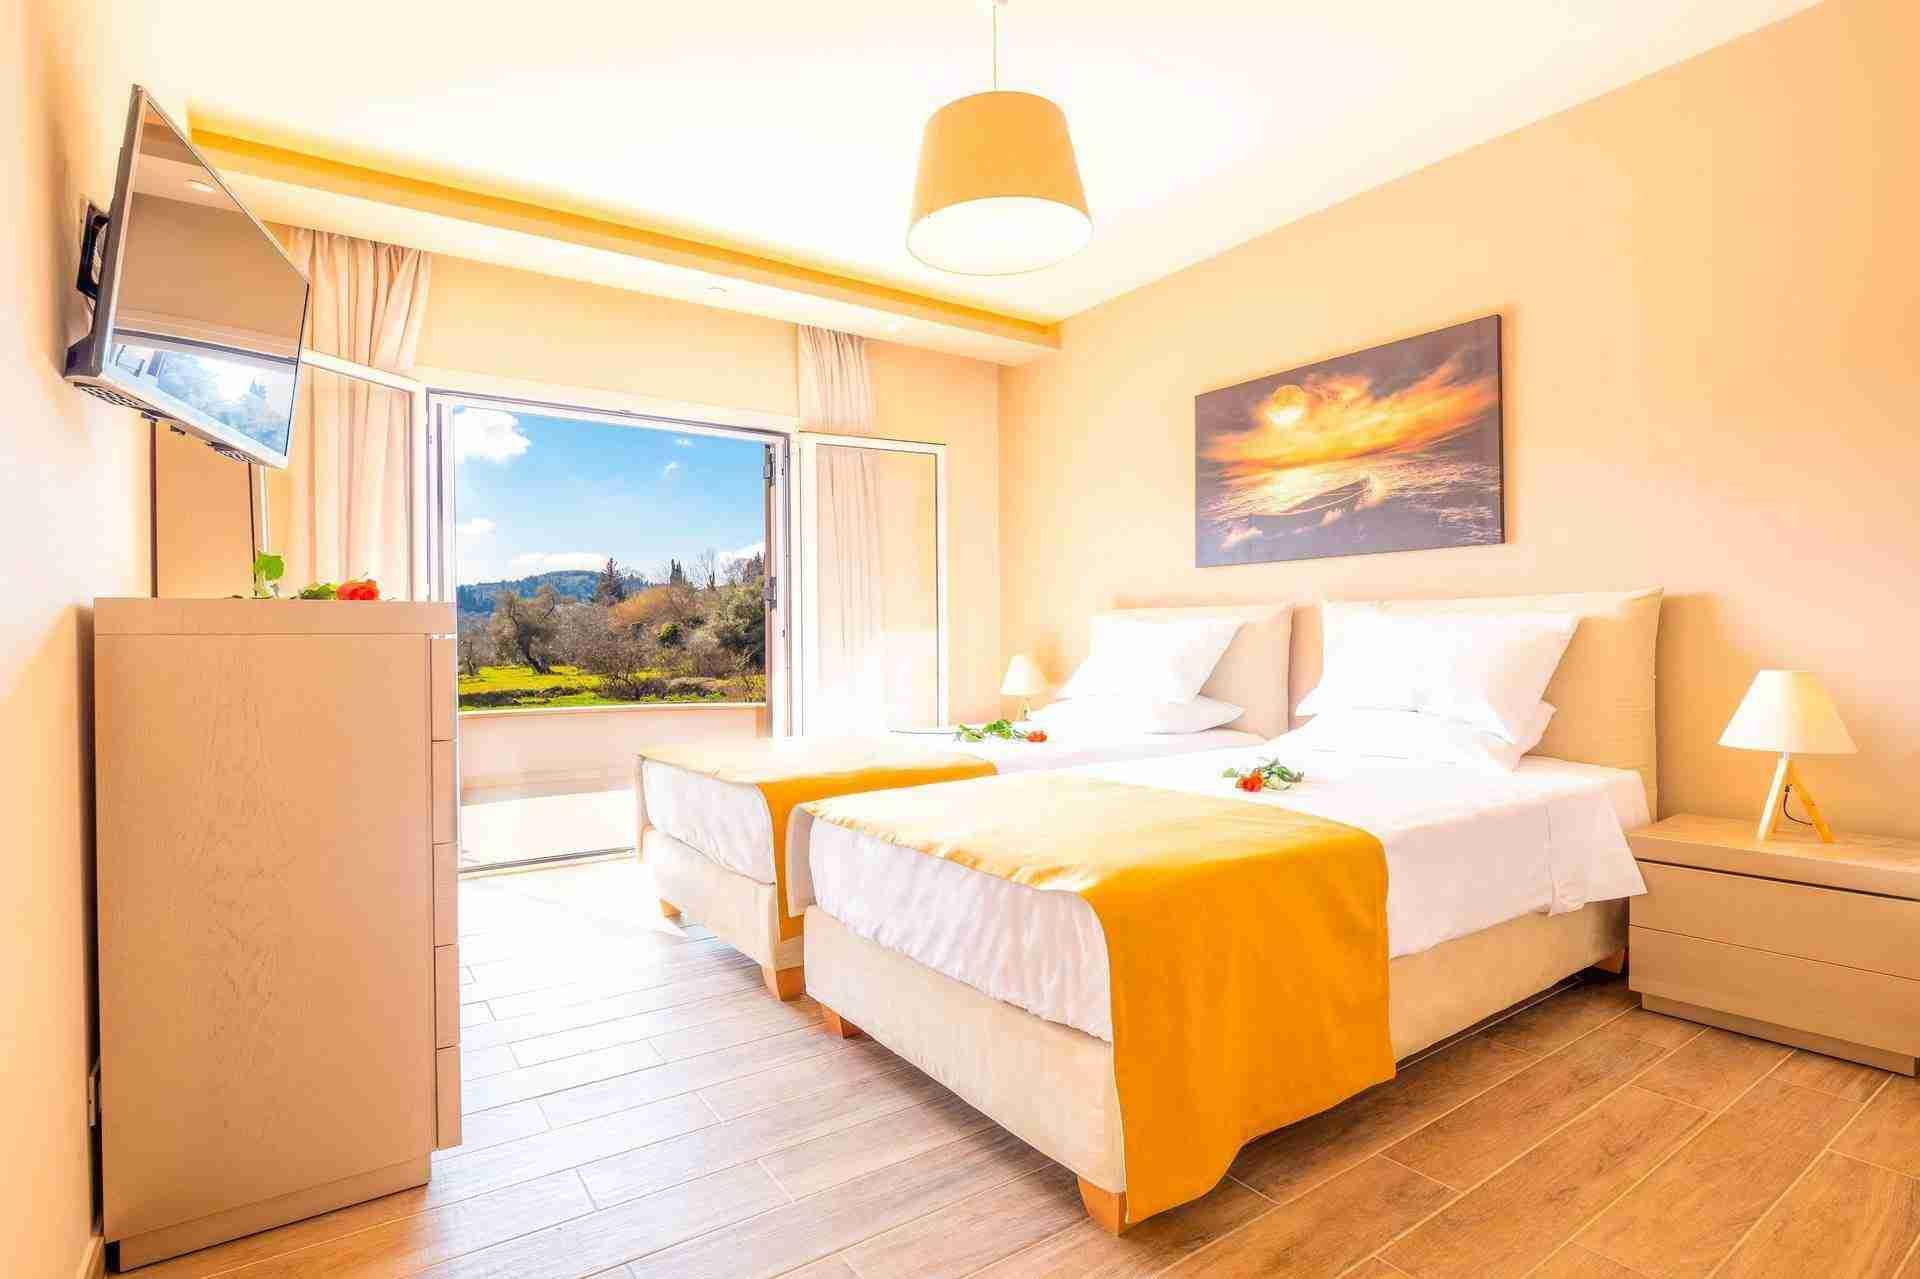 18 Petra twin bedroom